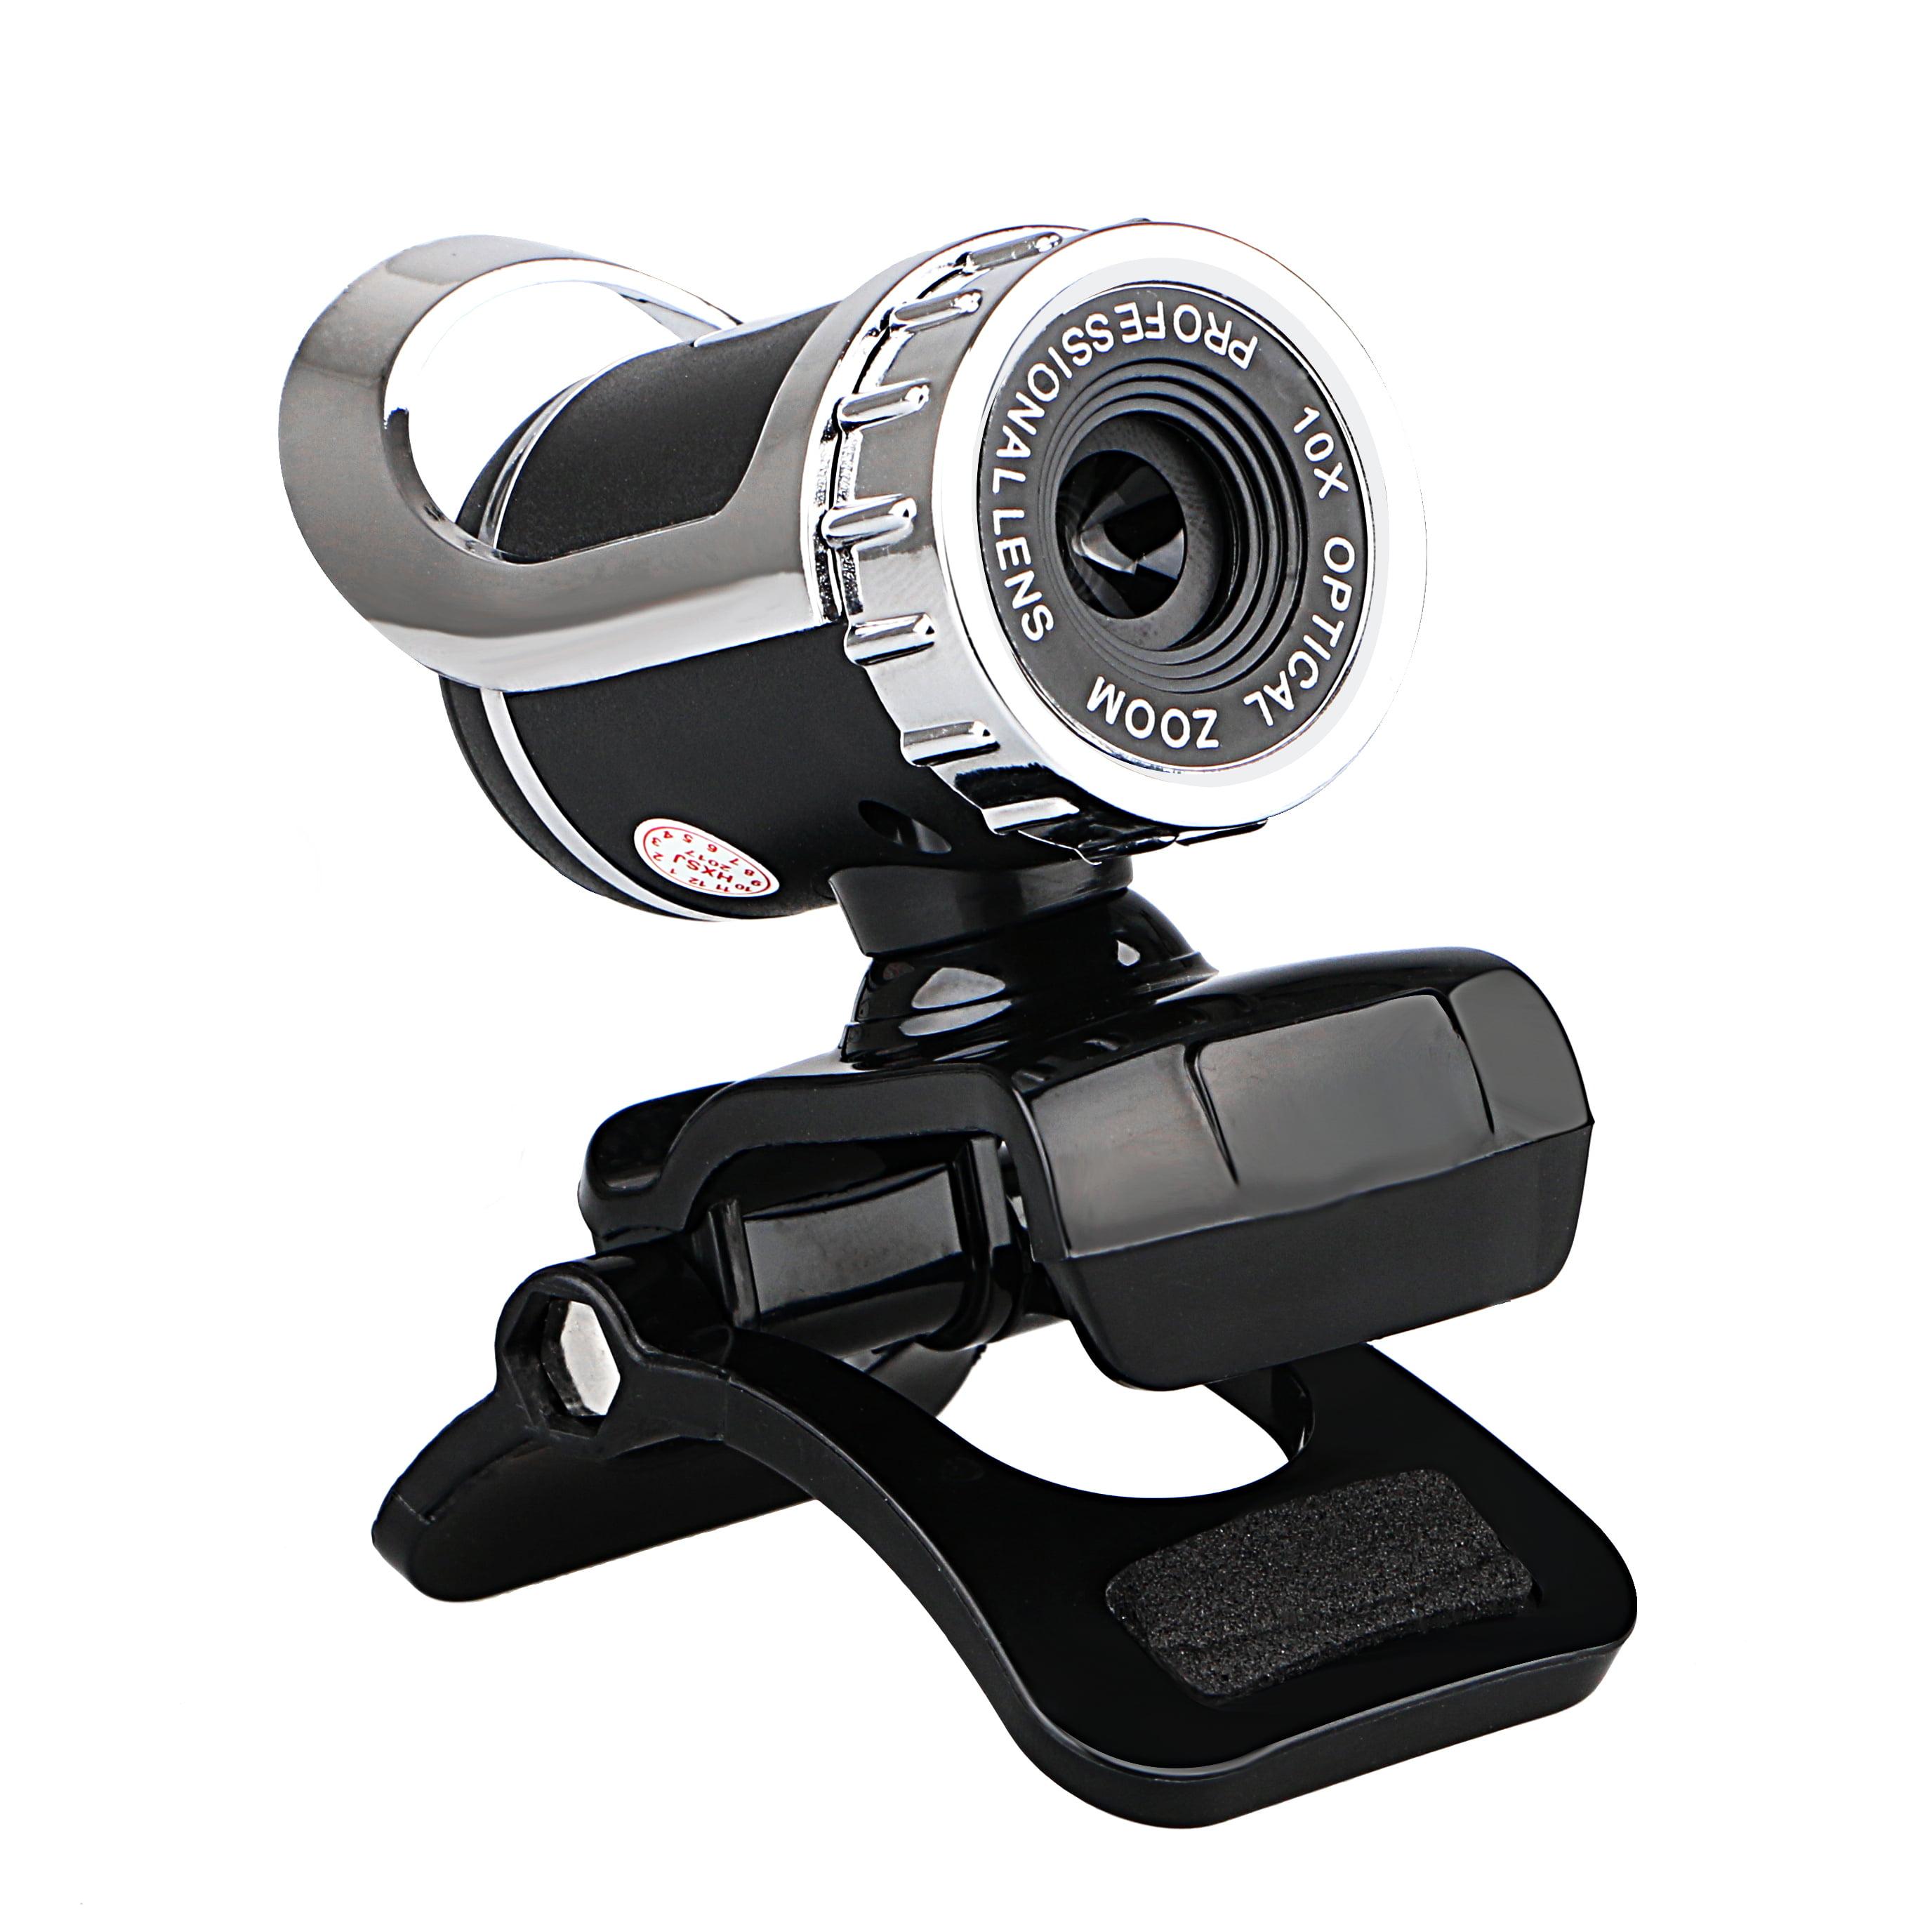 EEEKit HD Webcam, 12.0 Megapixels USB 2.0 1080P Clip-on Digital Video HD Web Camera for Desktop PC Laptop Skype with Built-in Sound Absorption Microphone